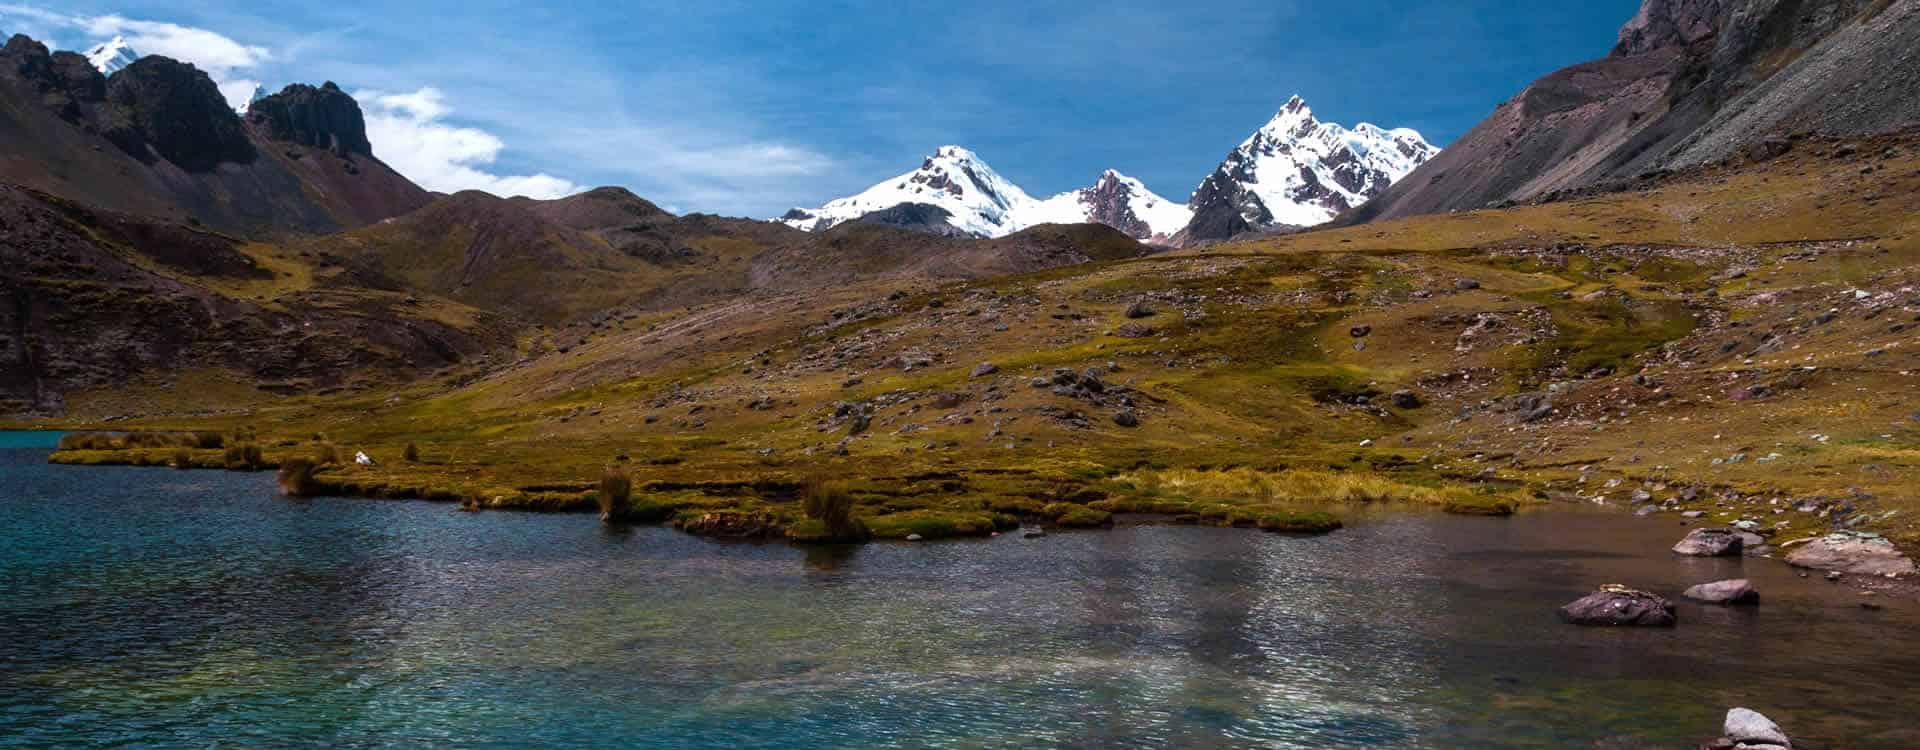 Hiking to 7 lagunas of Ausangate